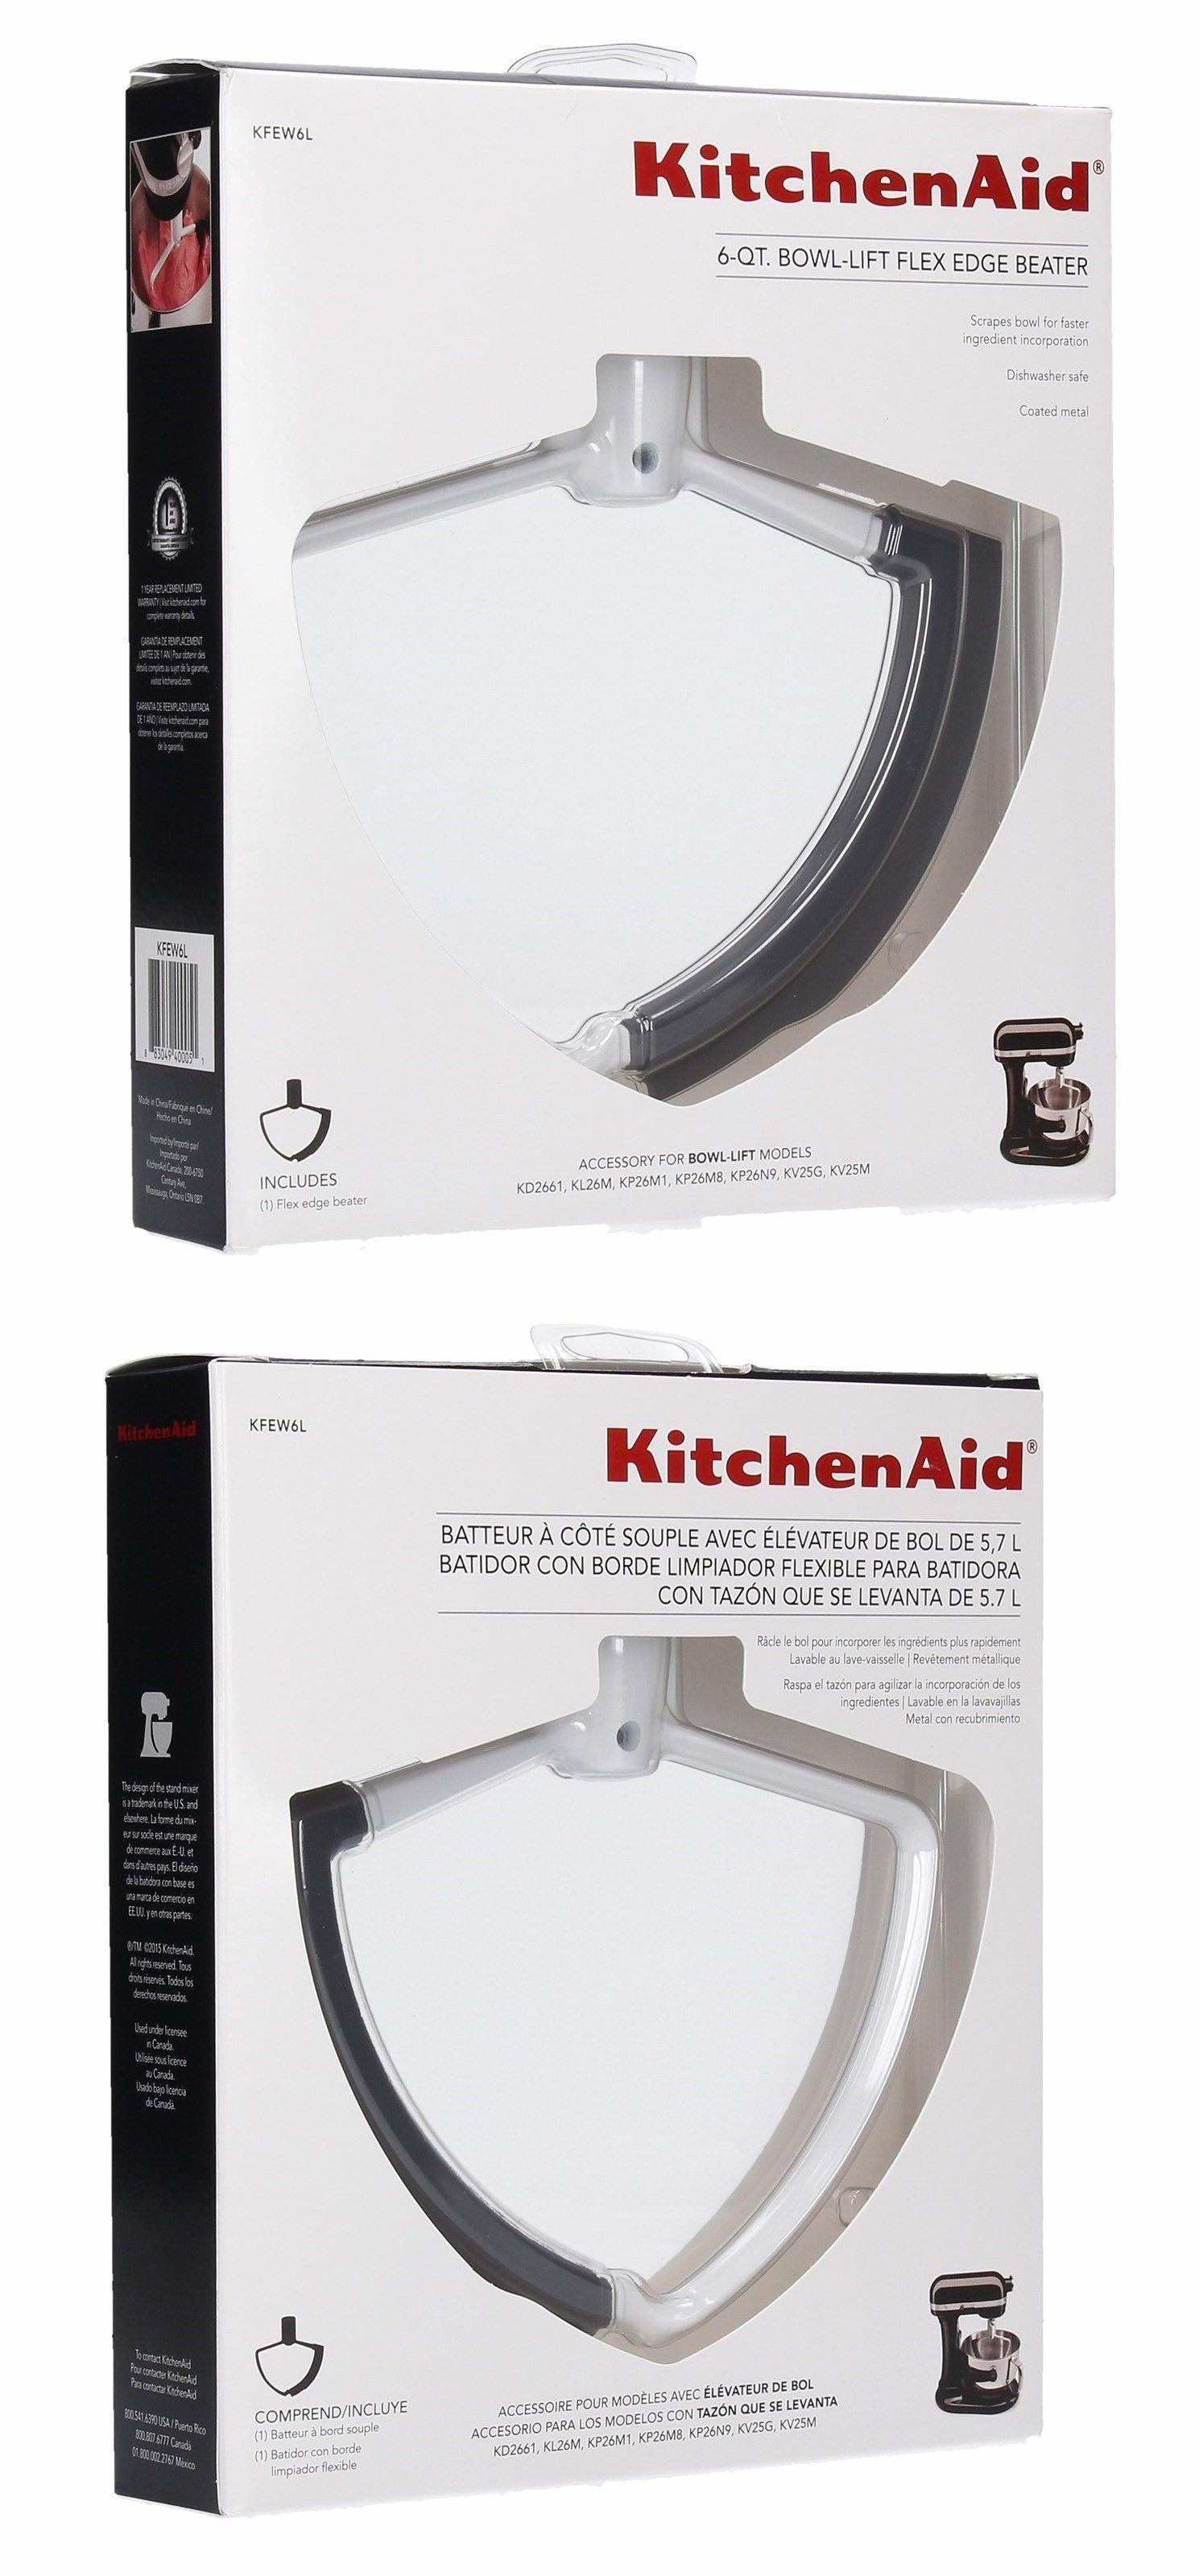 Countertop mixers 133701 kitchenaid kfew6l flex edge